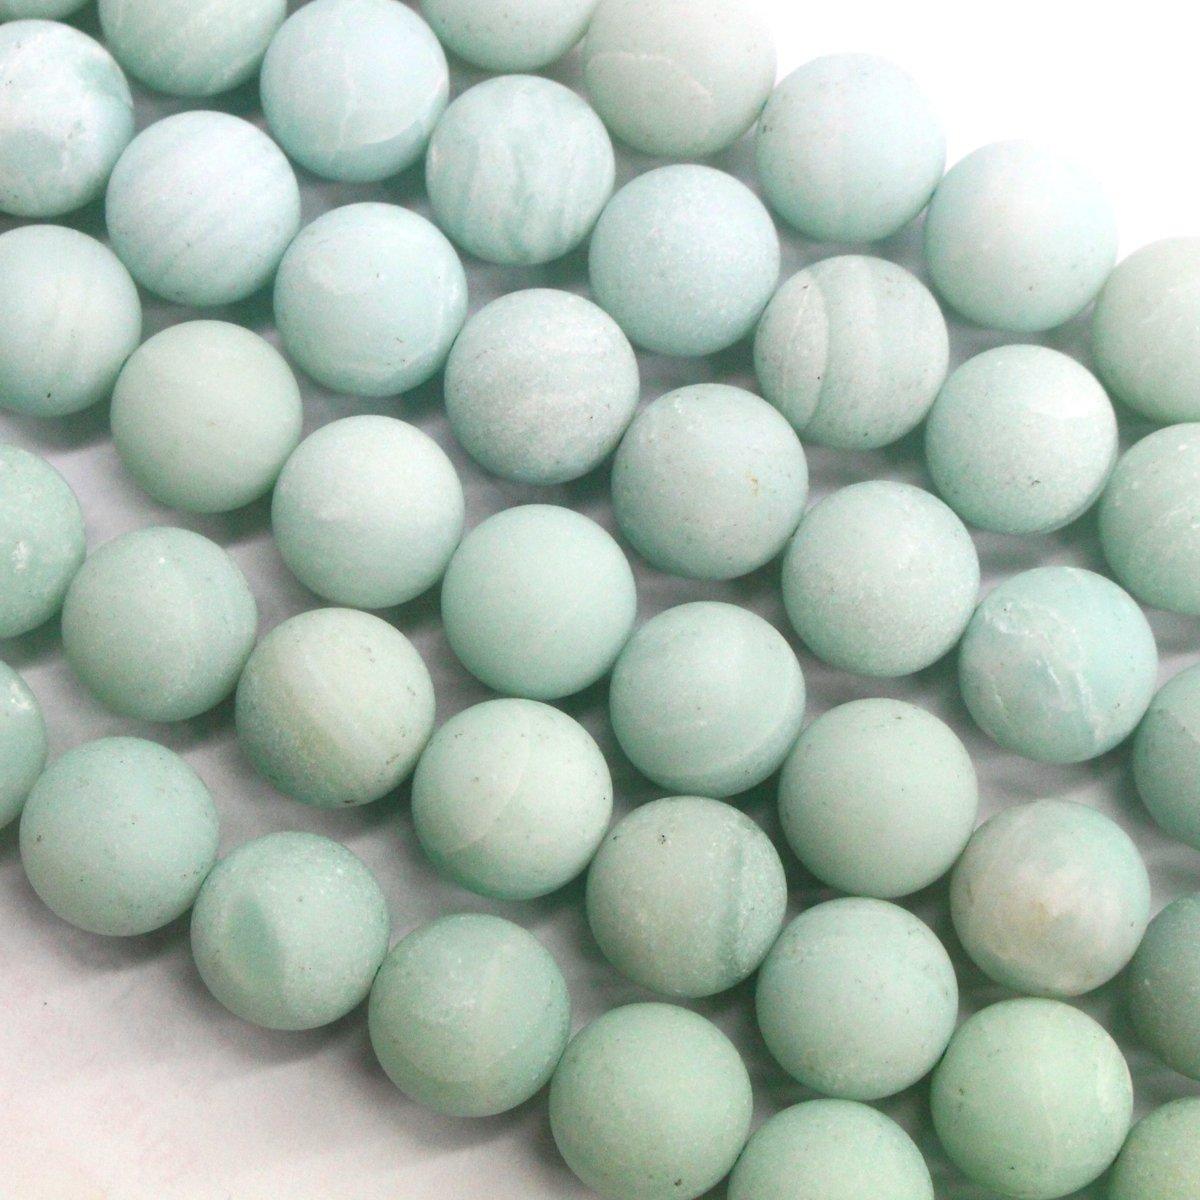 Natural Genuine Amazonite Unpolished Matte Round Real Gemstone Jewelry Making Loose Beads (12mm)